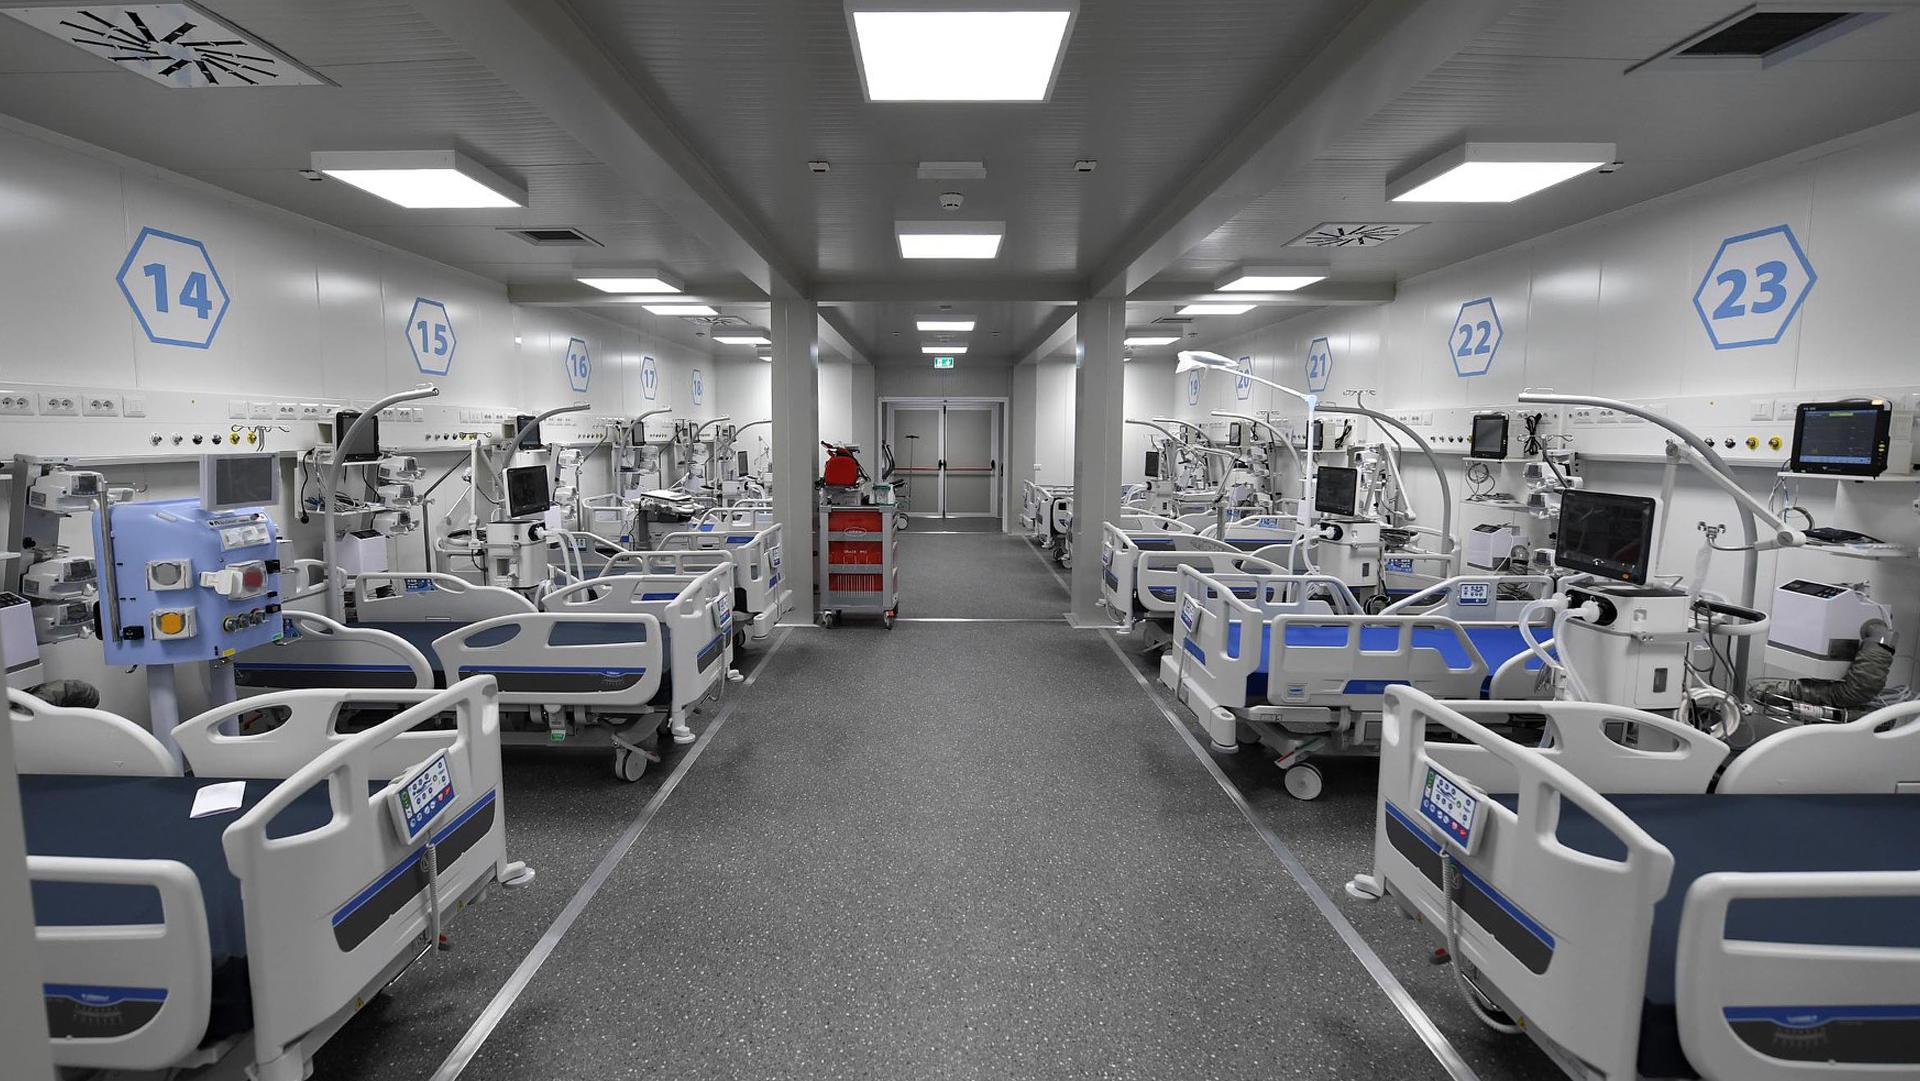 Piano Pandemico - Terapie Intensive Campania